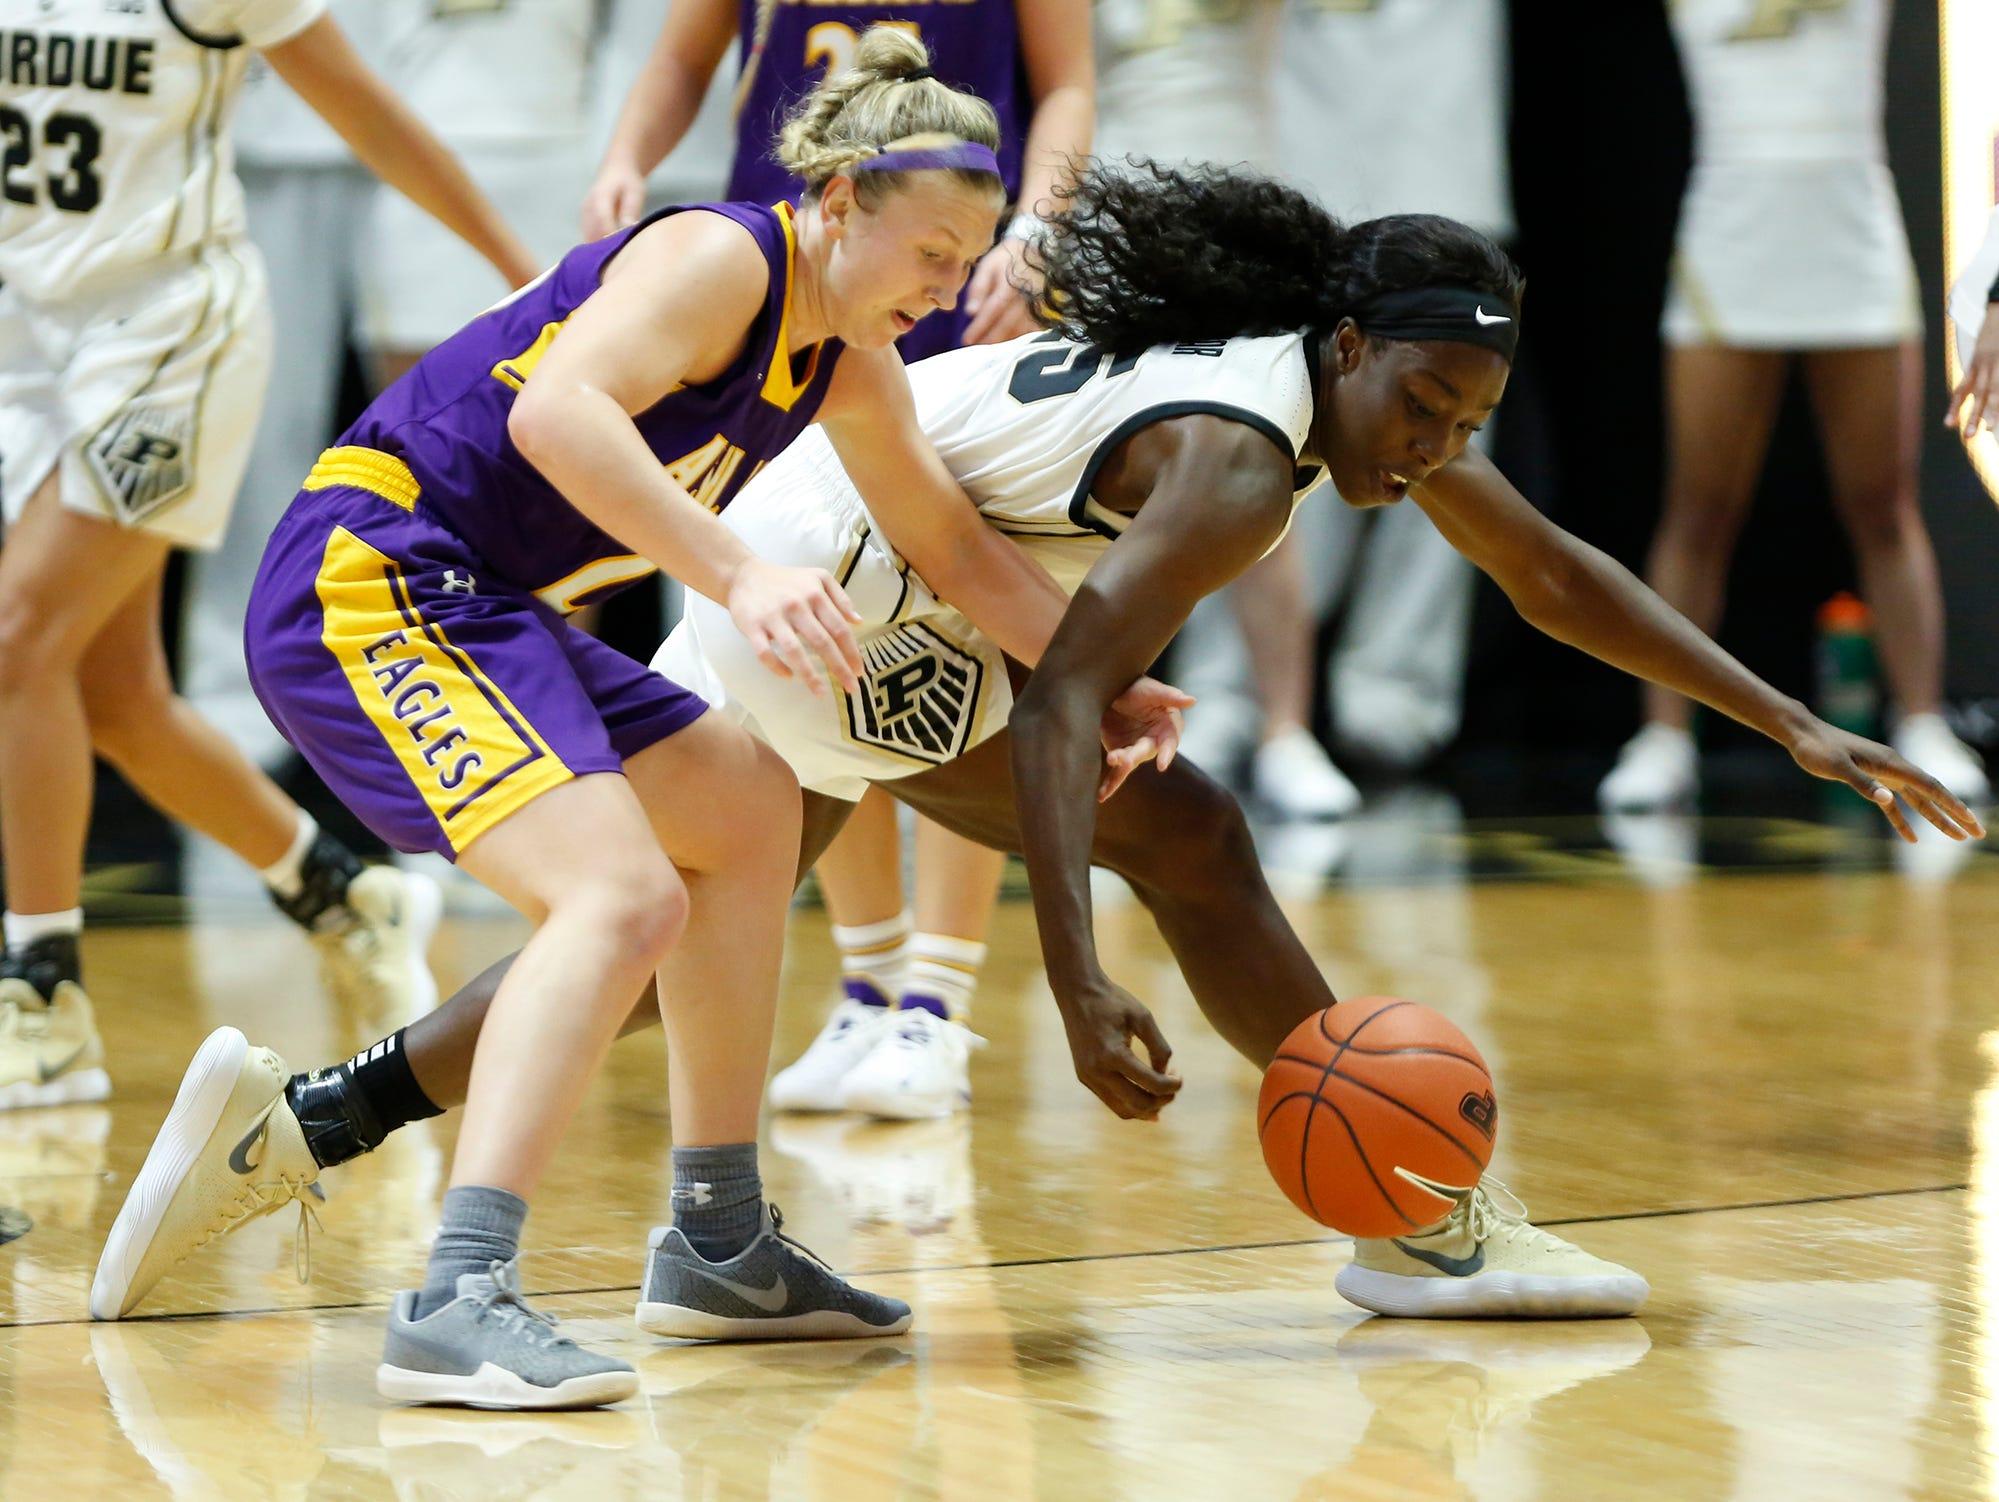 Tamara Farquhar of Purdue tries to steal the ball from Hallie Heidemann of Ashland Sunday, November 4, 2018, at Mackey Arena. Purdue defeated Ashland 85-69.